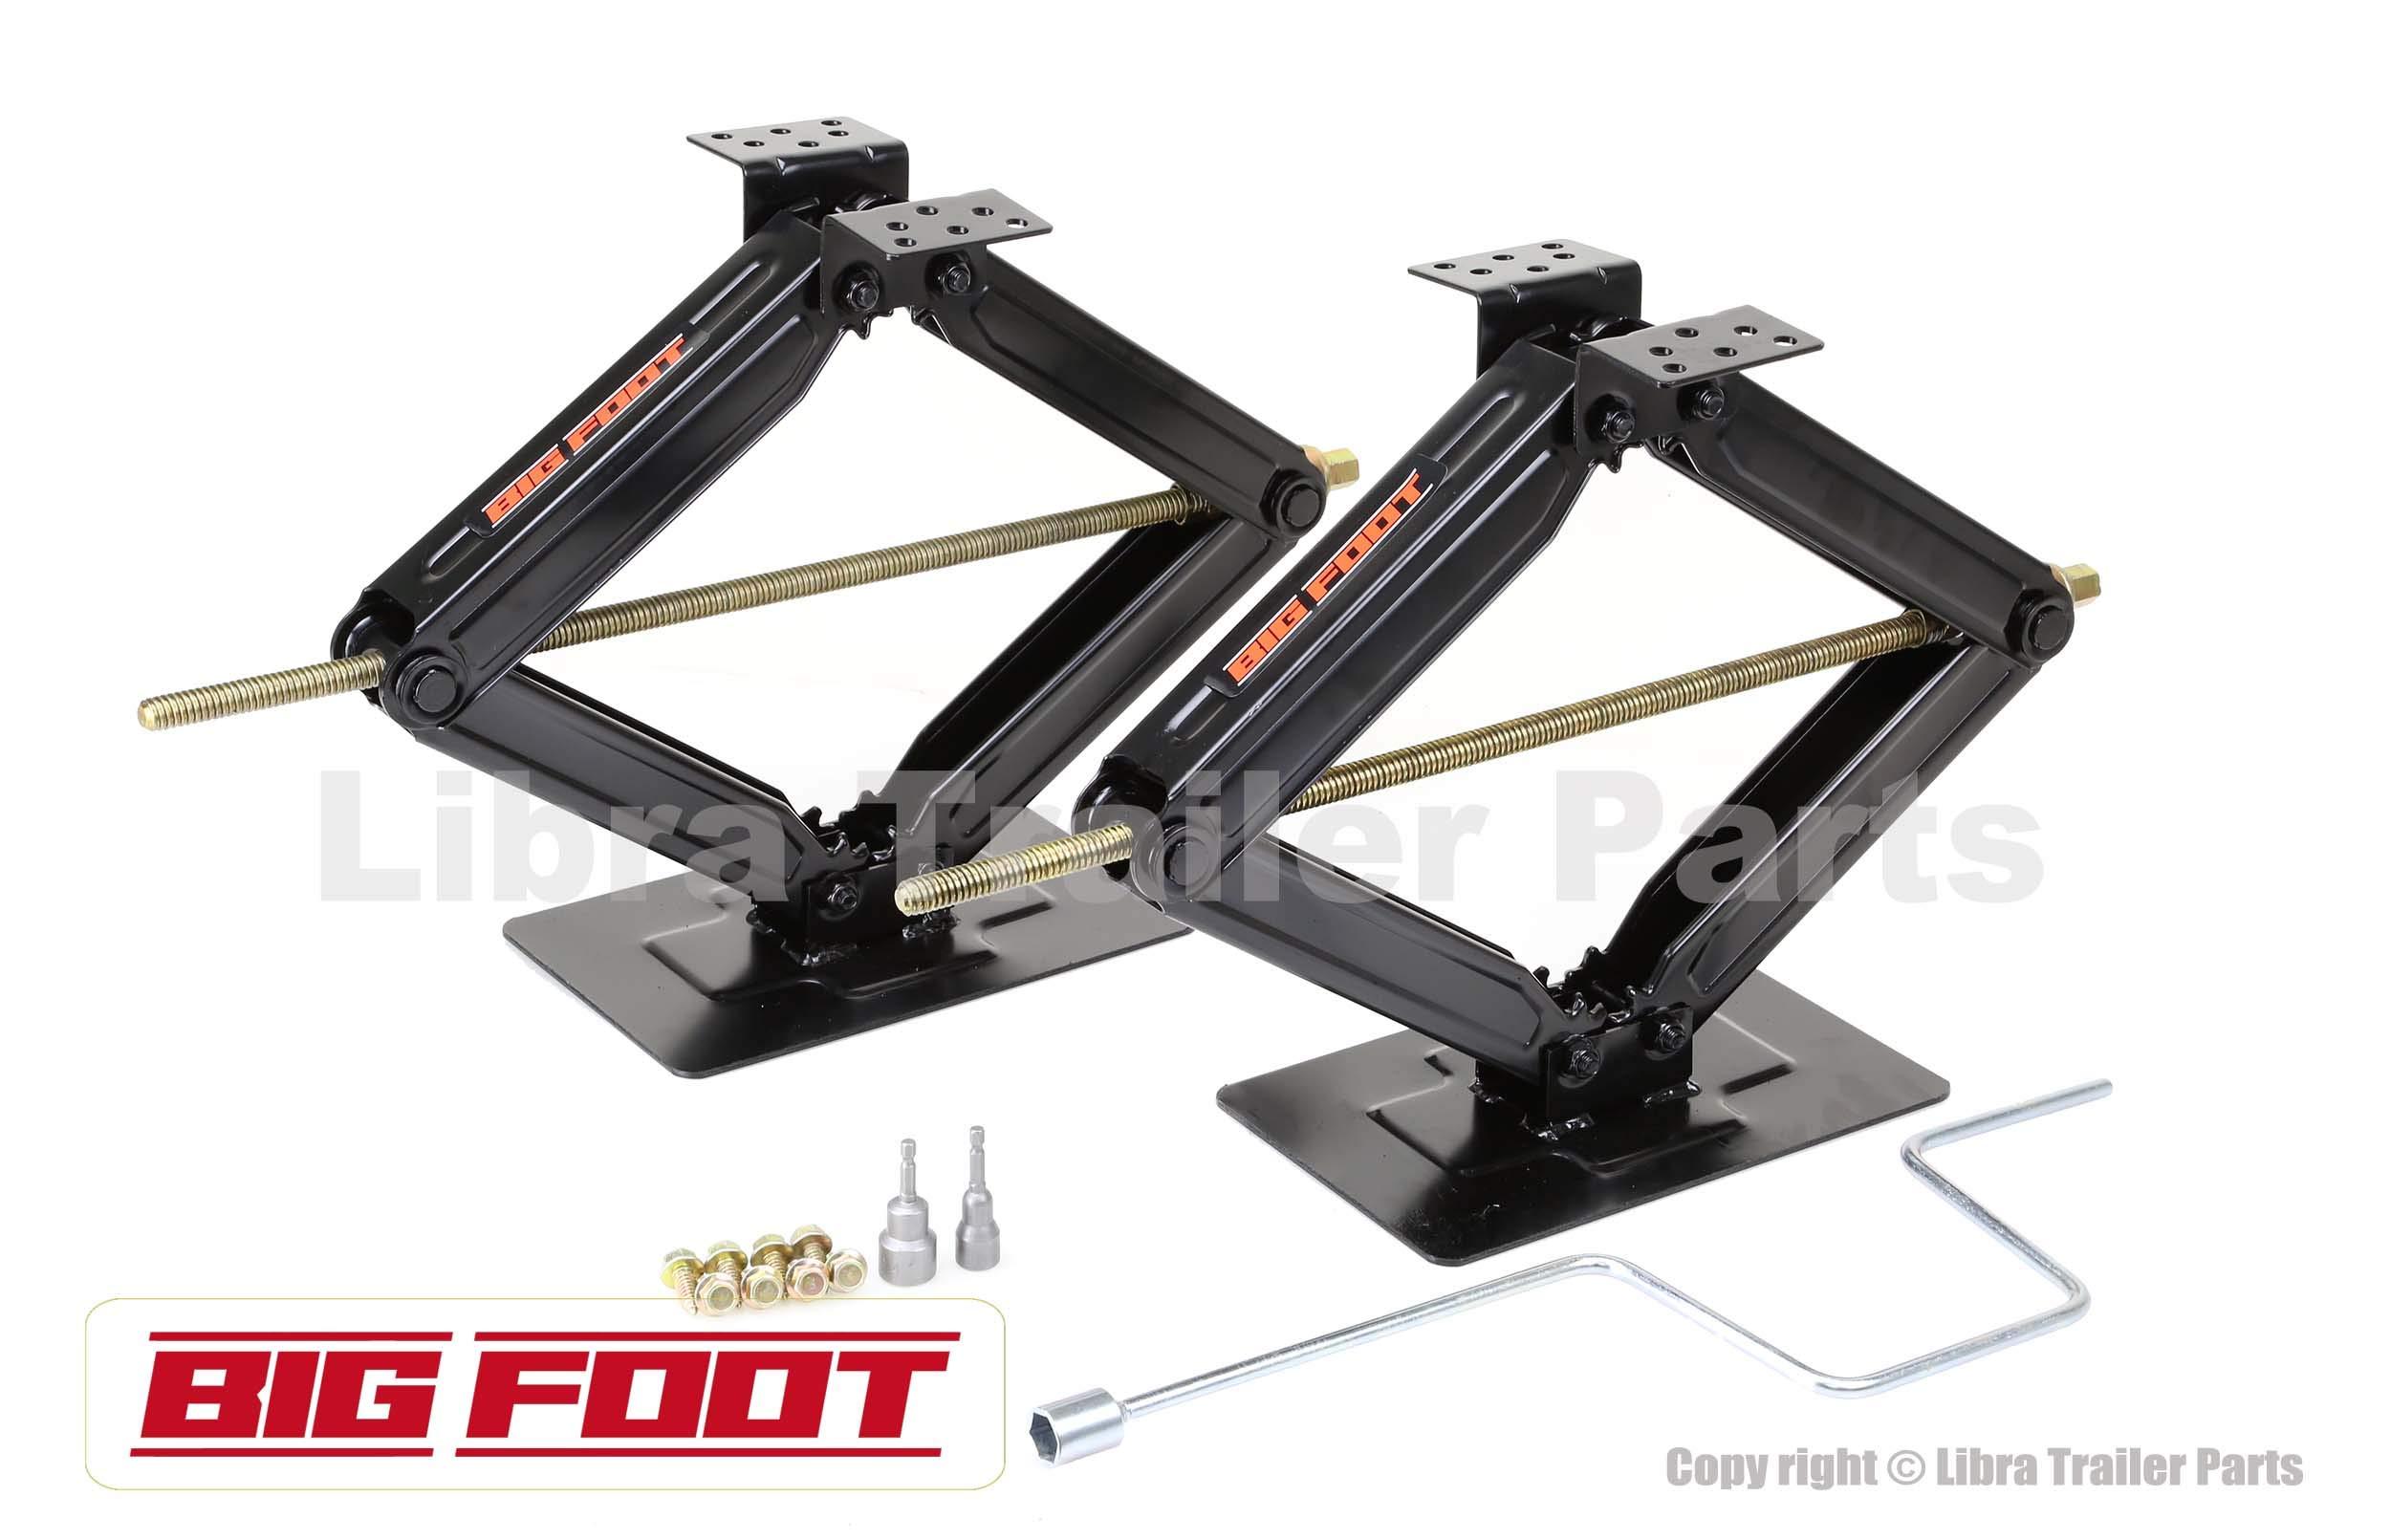 LIBRA Jack Drop Leg Foot Pad for 2 Standard Trailer Camper Jacks 26026